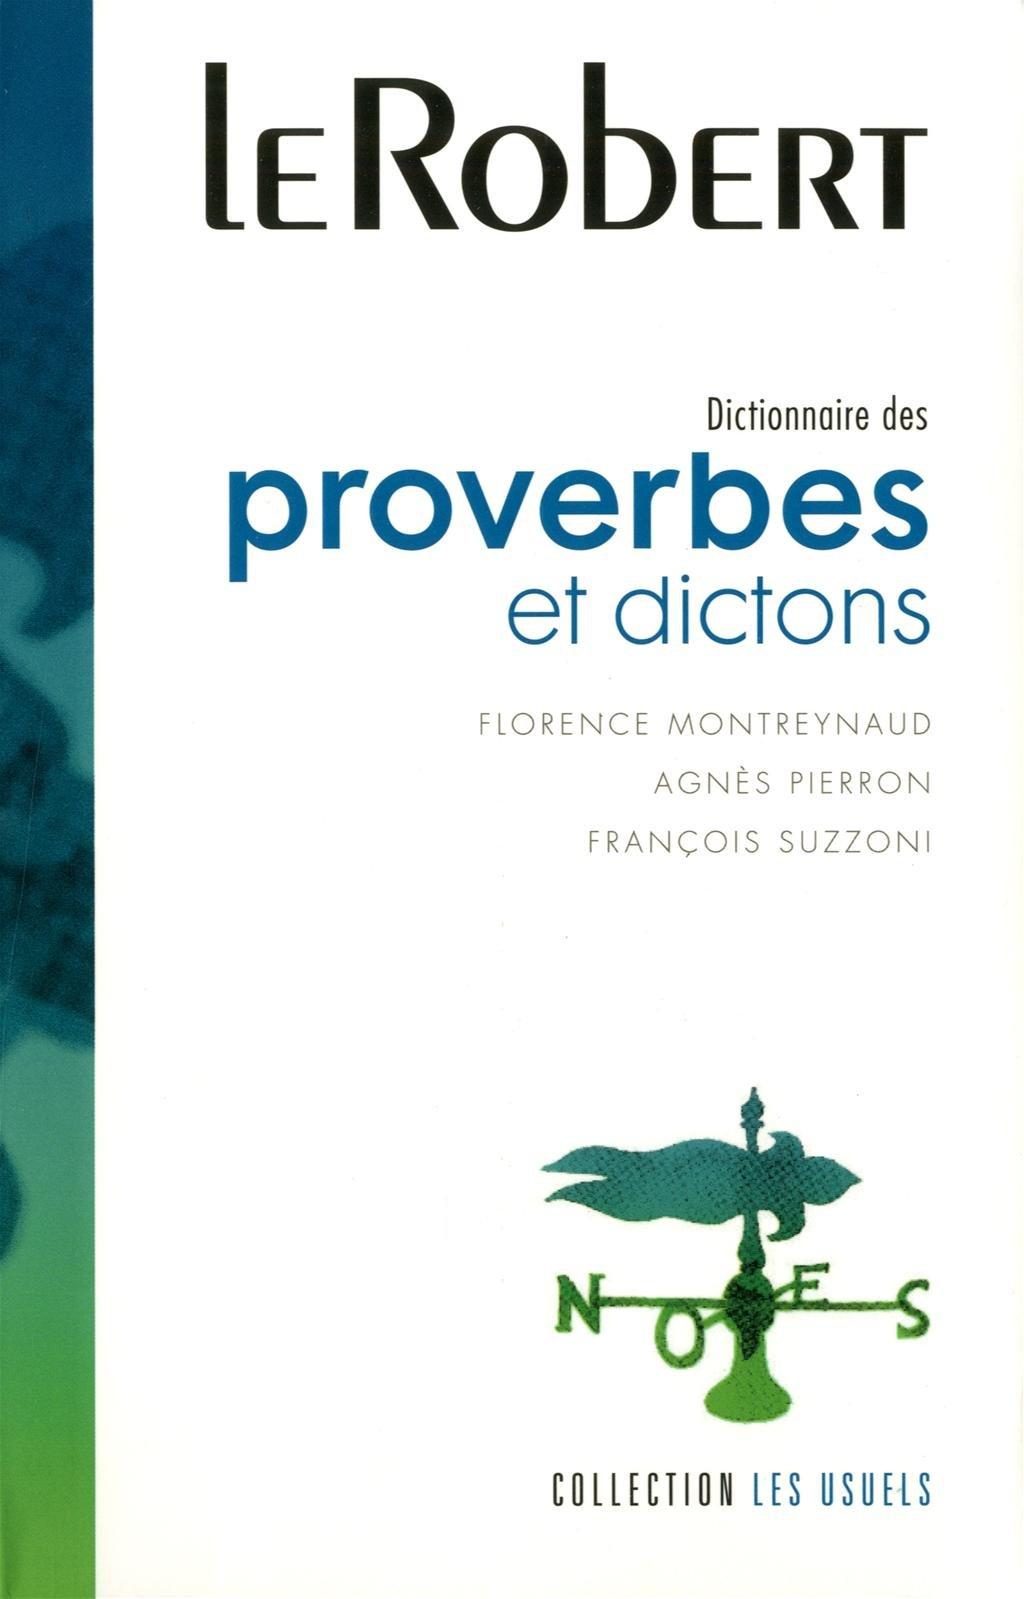 Proverbes Et Dictons: Large Flexi-Bound Edition (Usuels - Flexi Bound) (French Edition) pdf epub